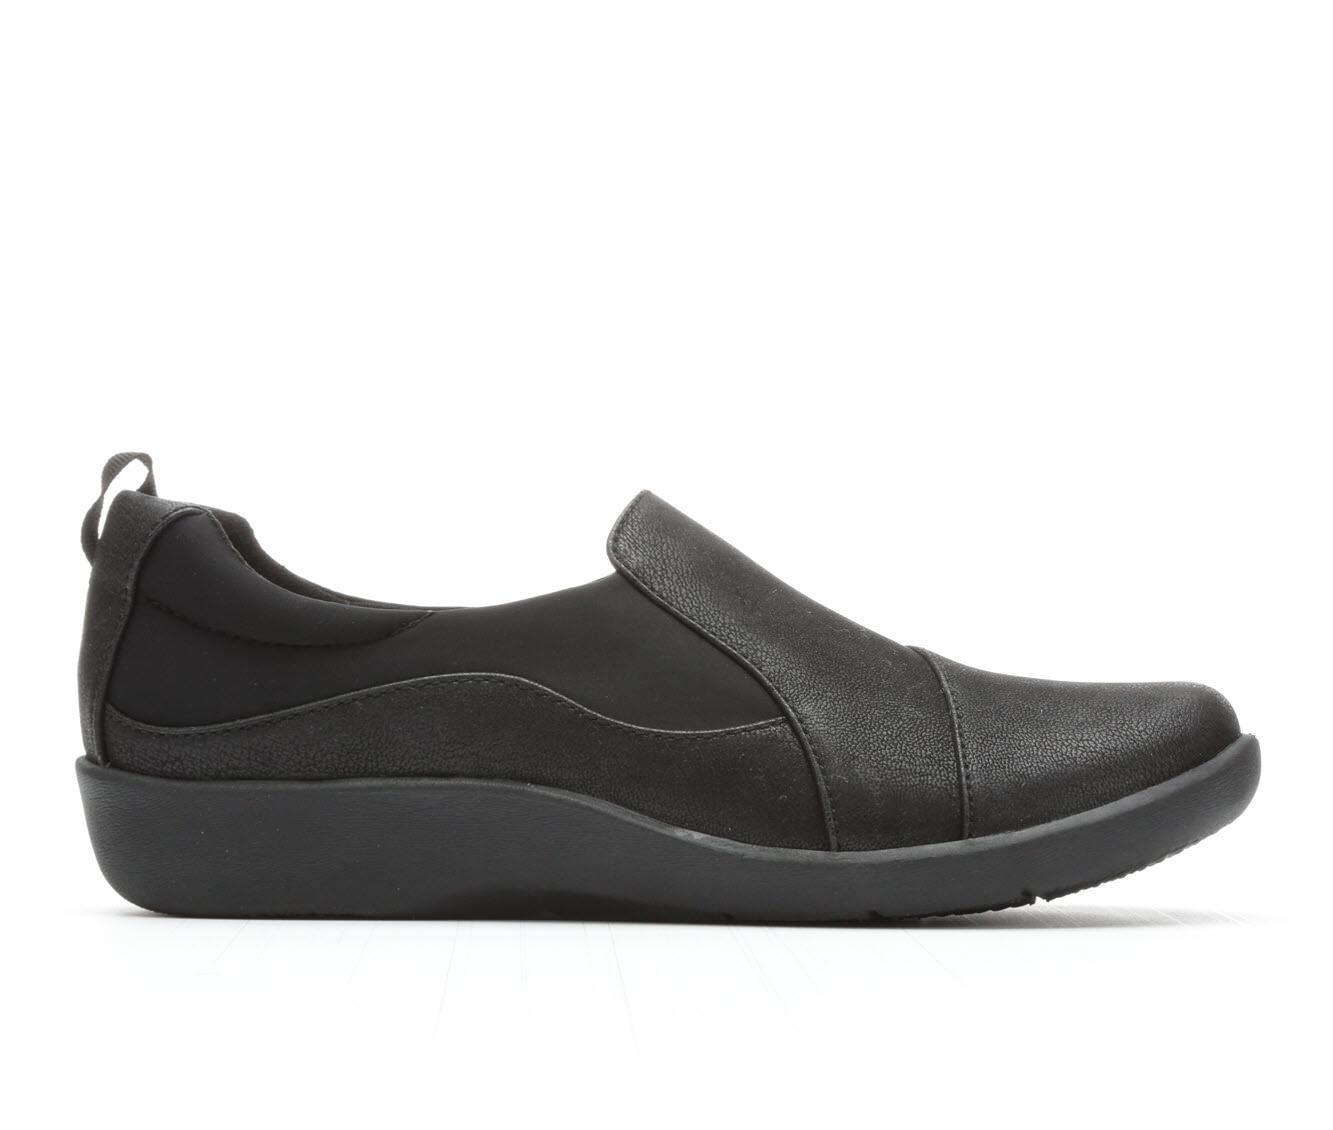 Clarks Cloudsteppers Sillian ... Paz Women's Shoes u57Pd